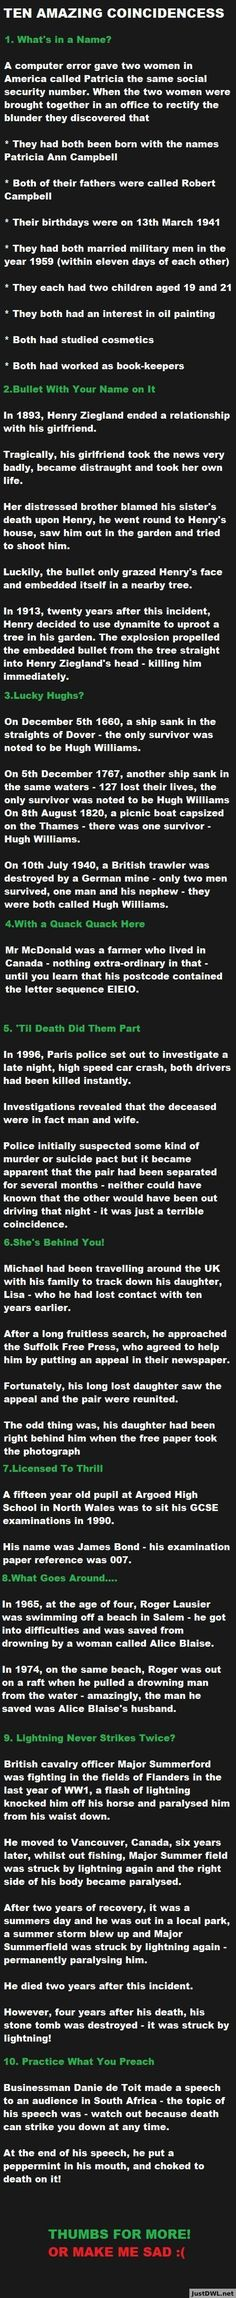 Ten Amazing Coincidences.